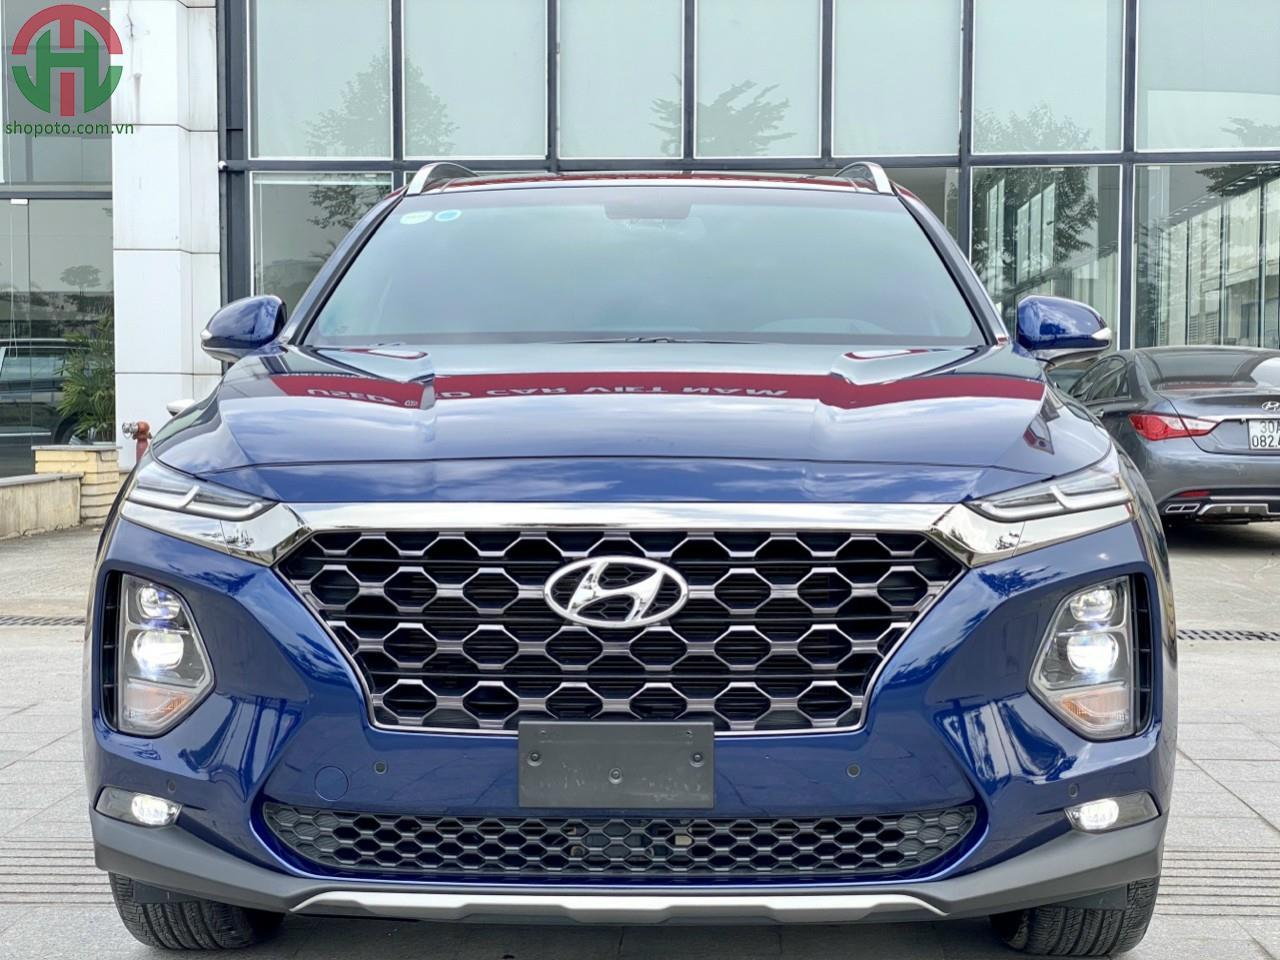 Hyundai Santafe 2.4 AT Premium